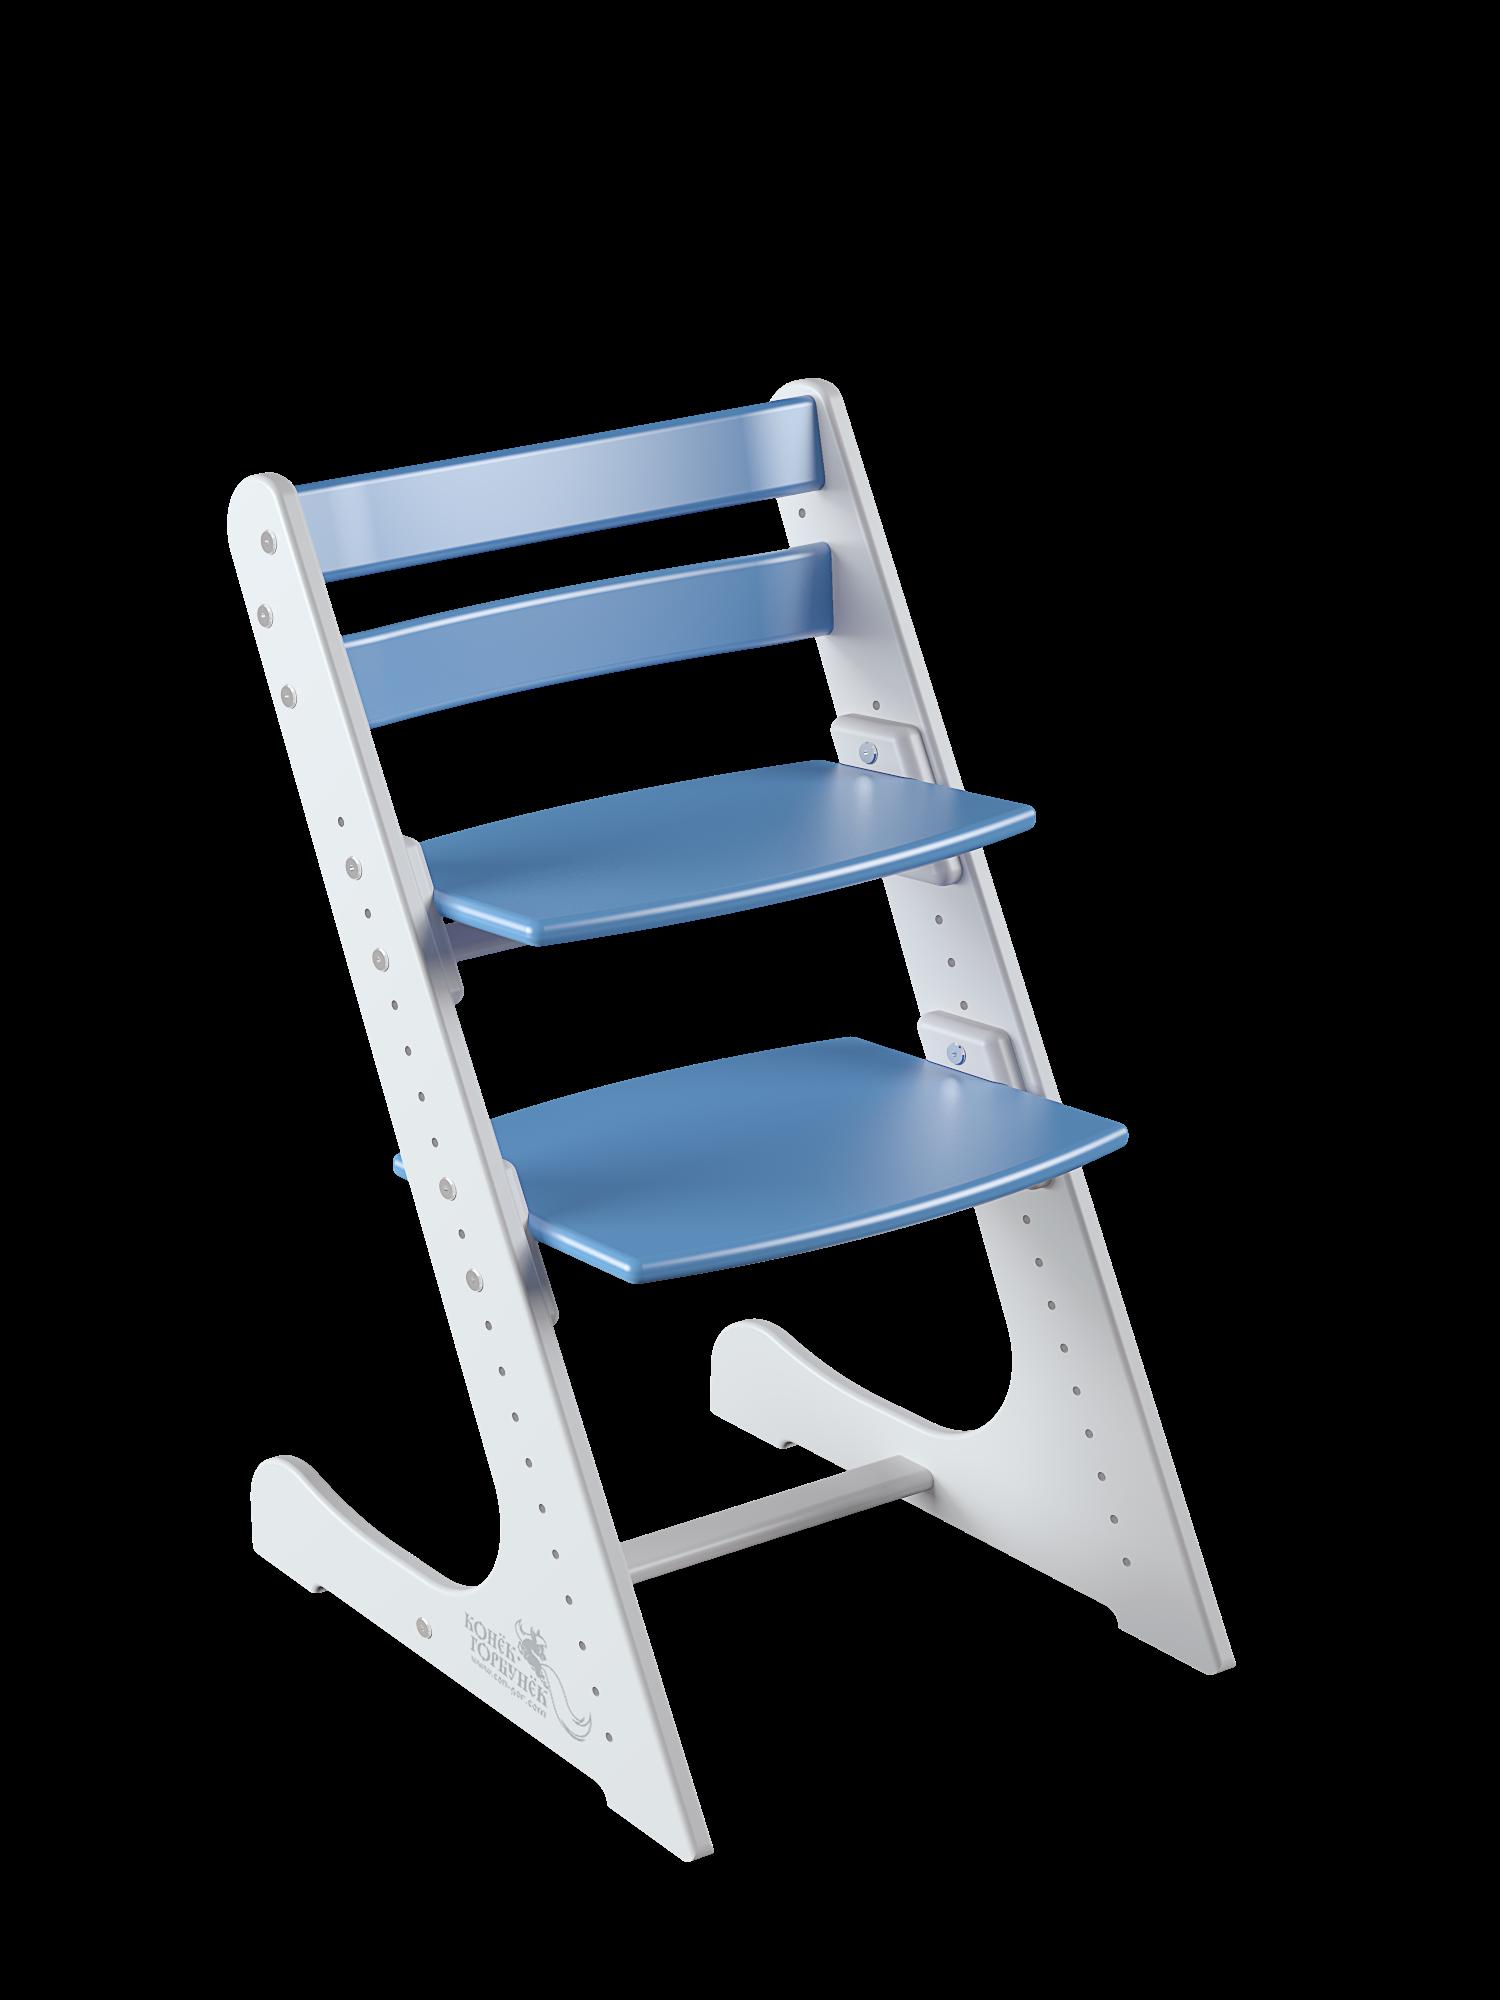 Детский растущий стул Конек Горбунек Комфорт Бело